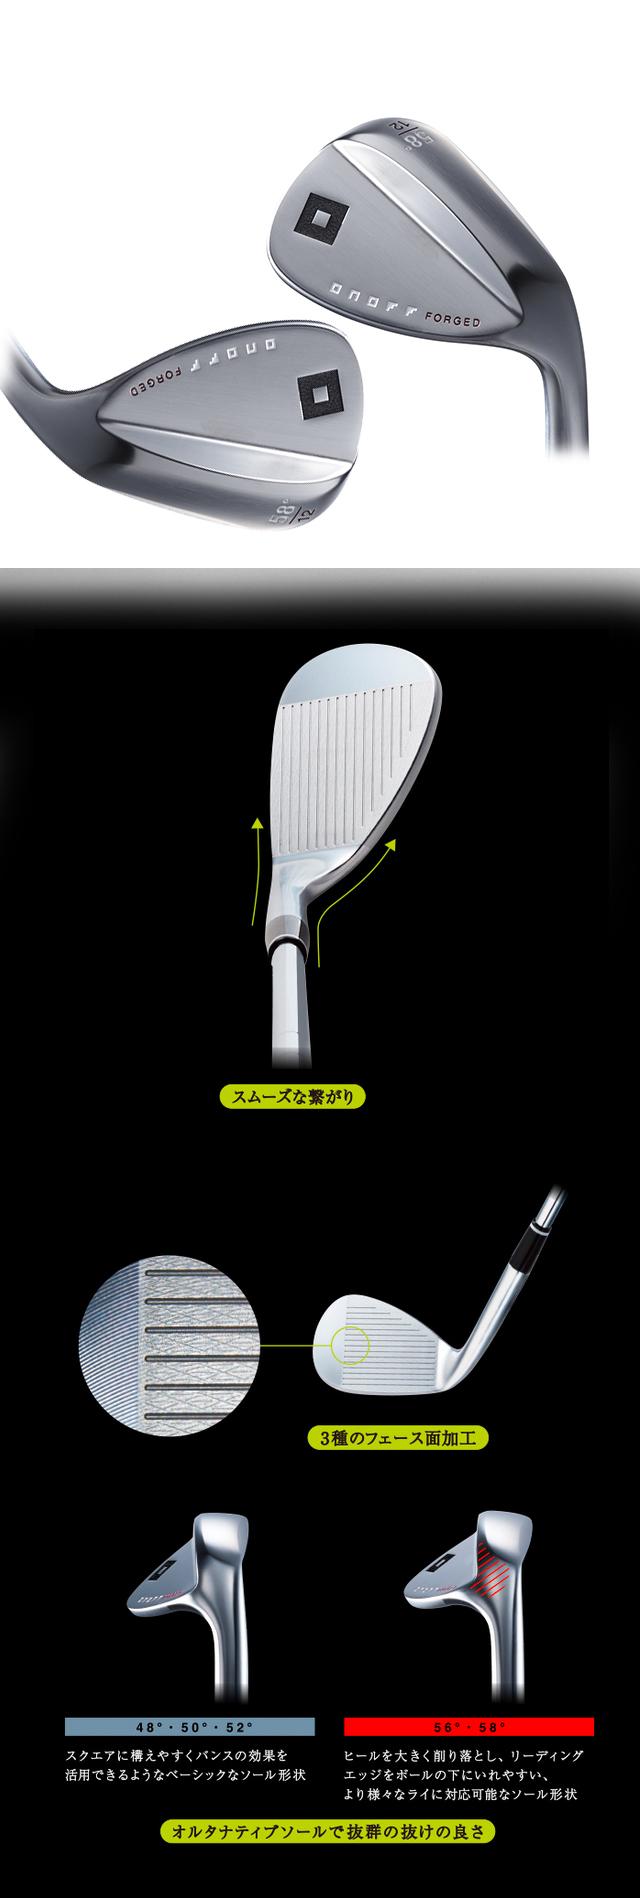 2014 onoff golf